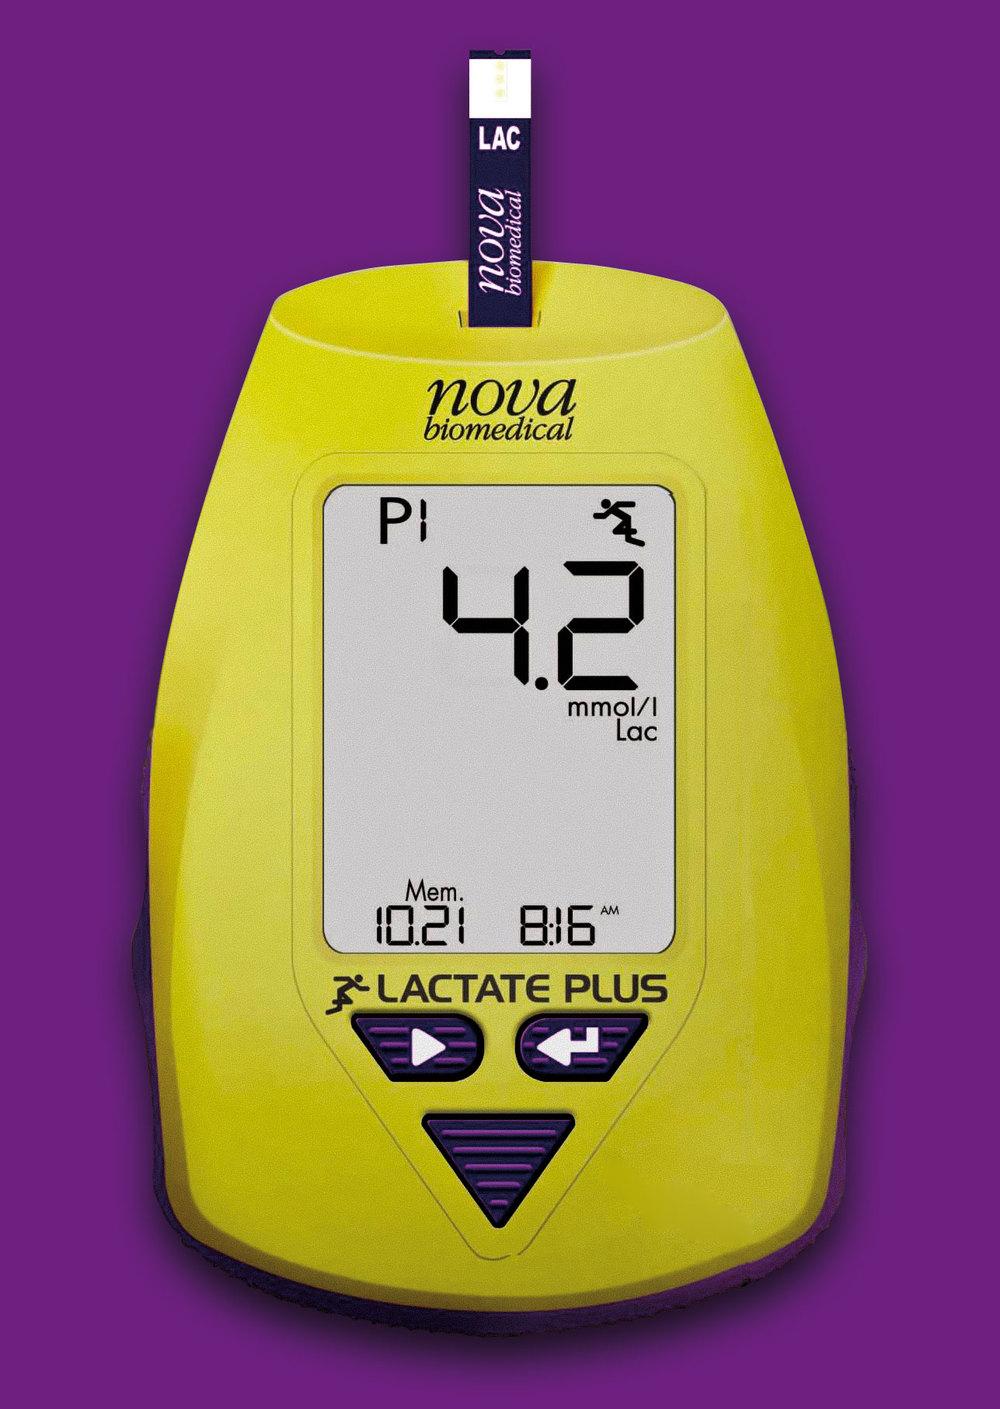 lactate-plus-nova-misuratore-lattato